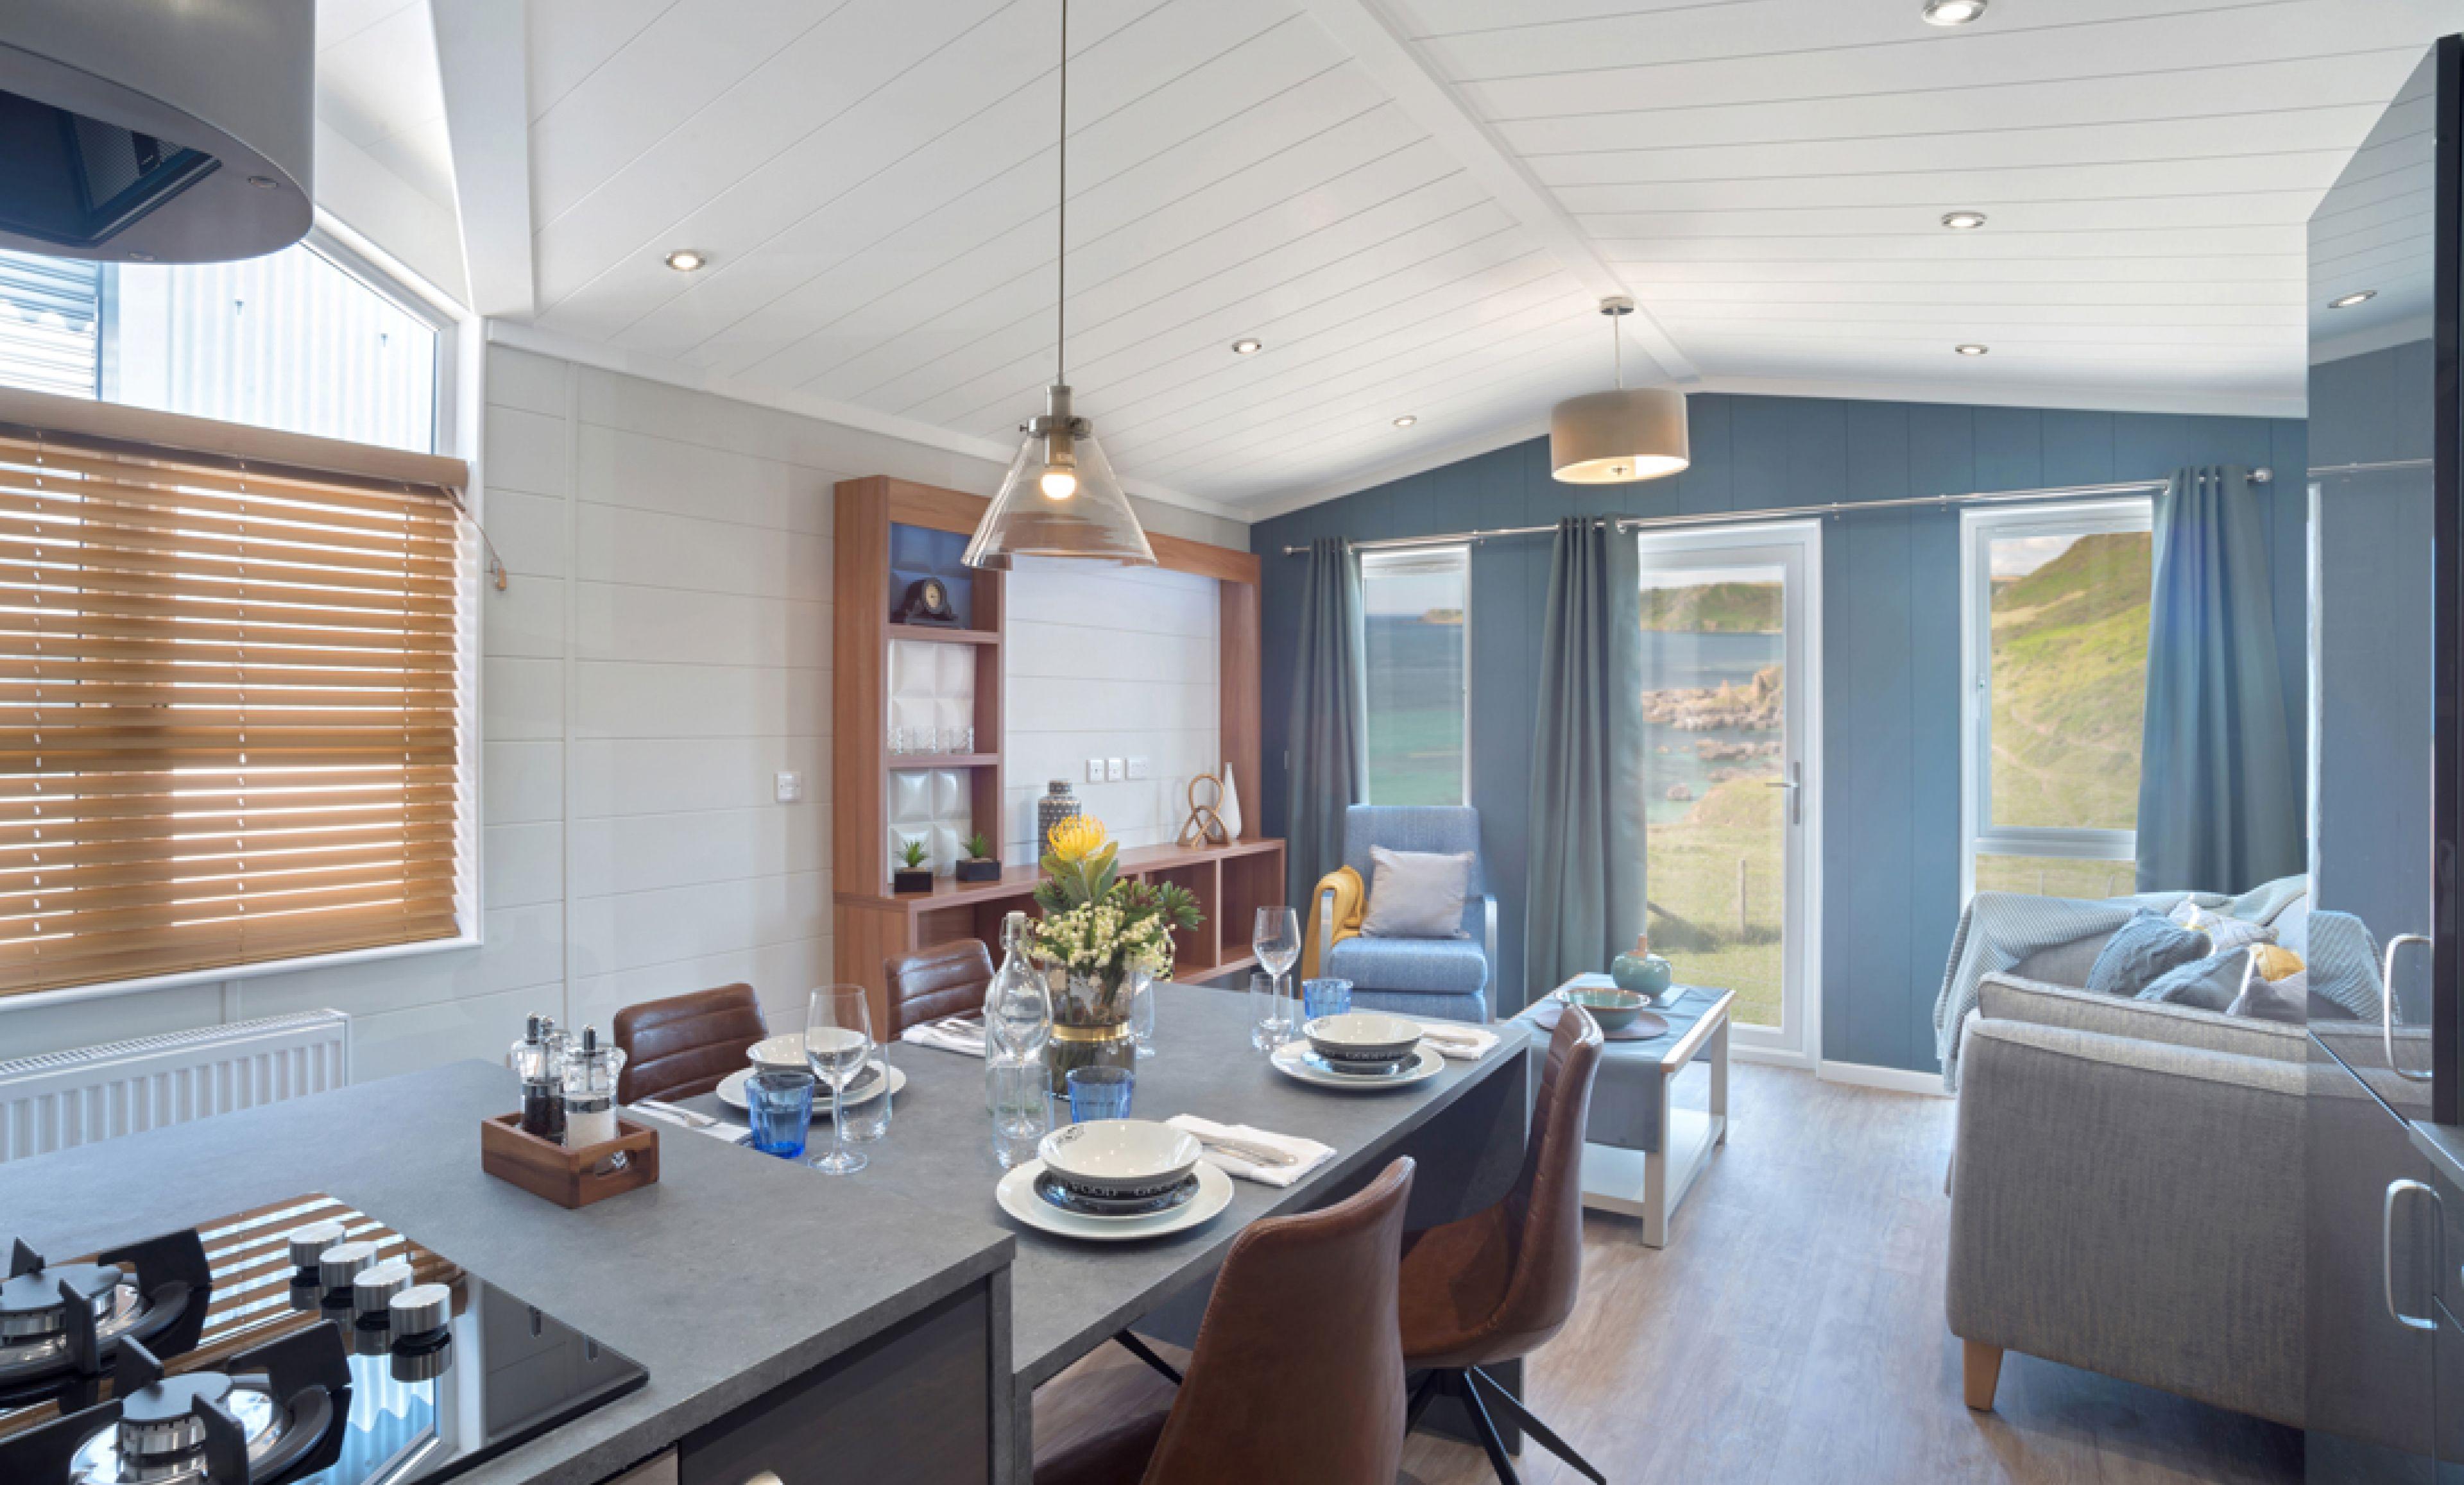 The Savannah - Dining Room